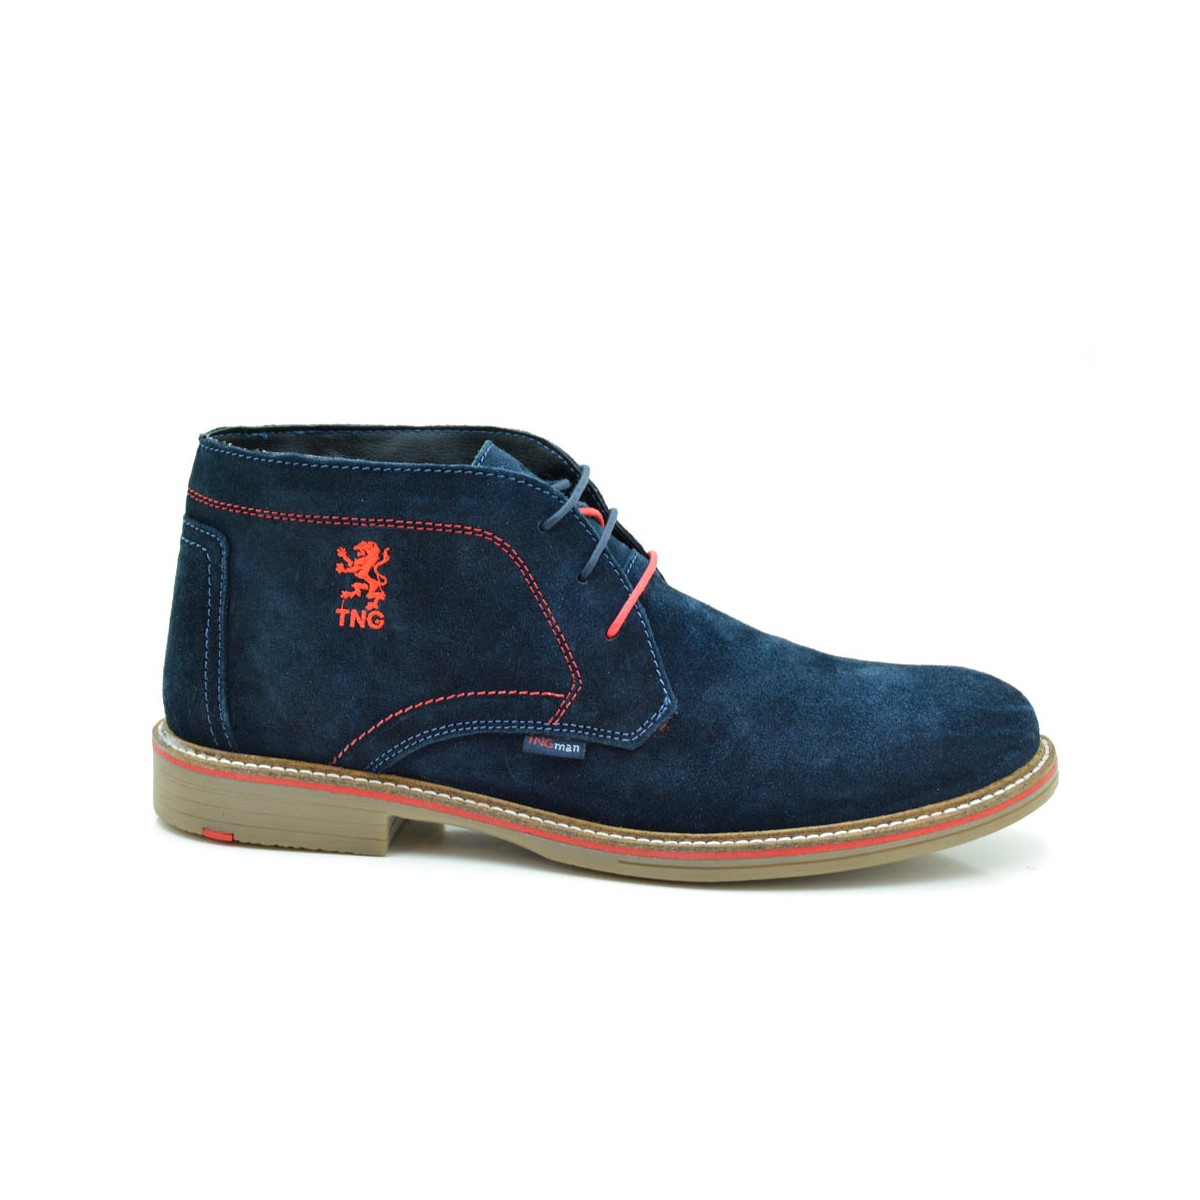 botas-hombre-bernabel (1).